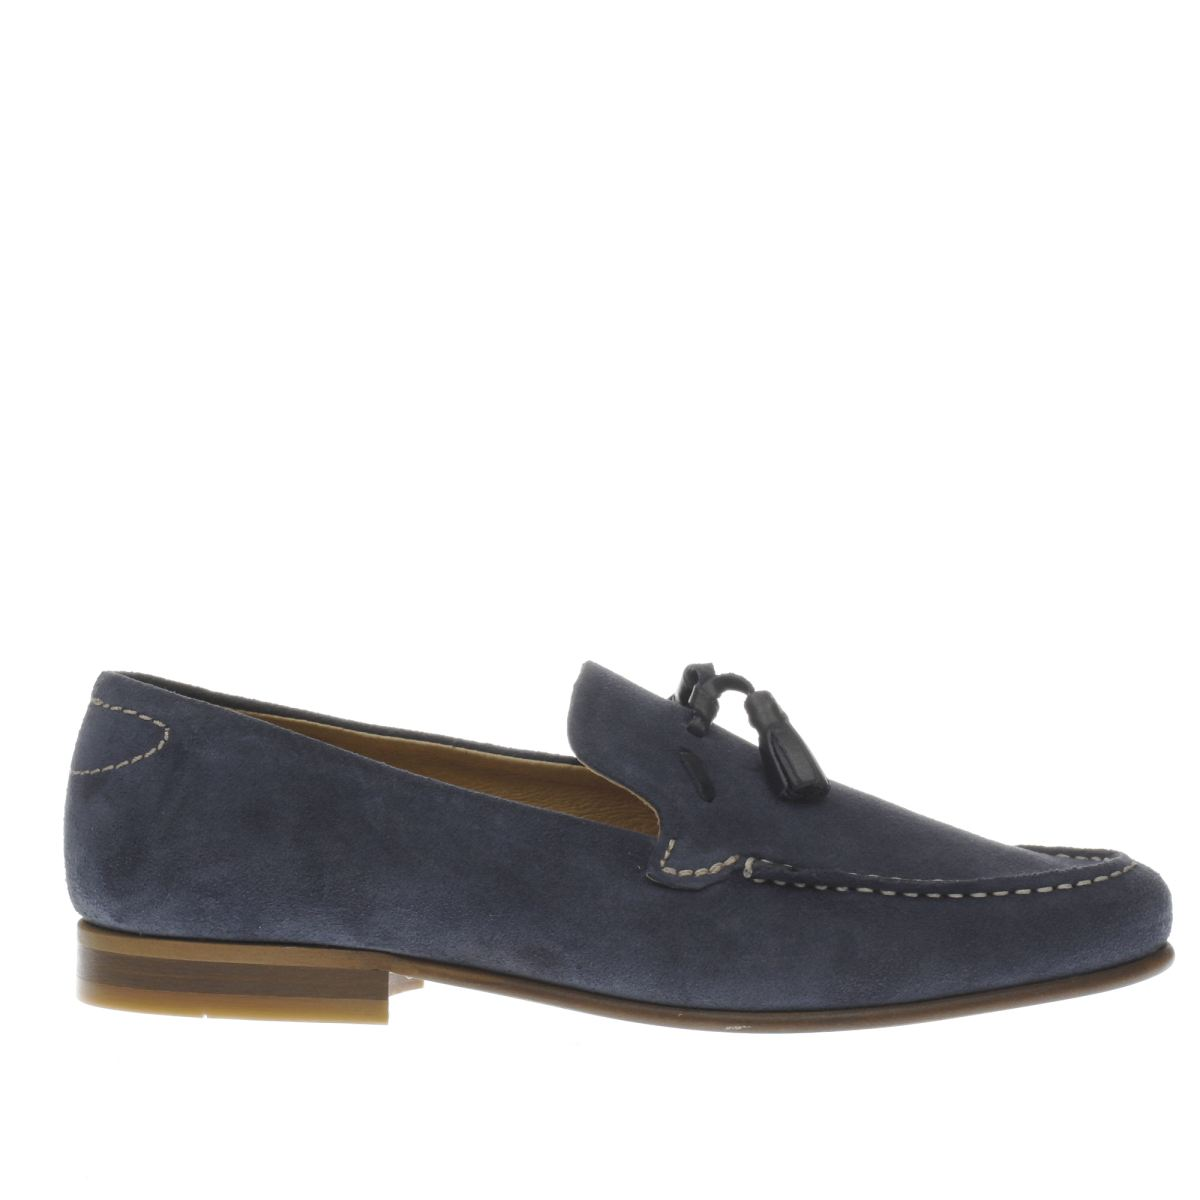 h by hudson navy bernini shoes